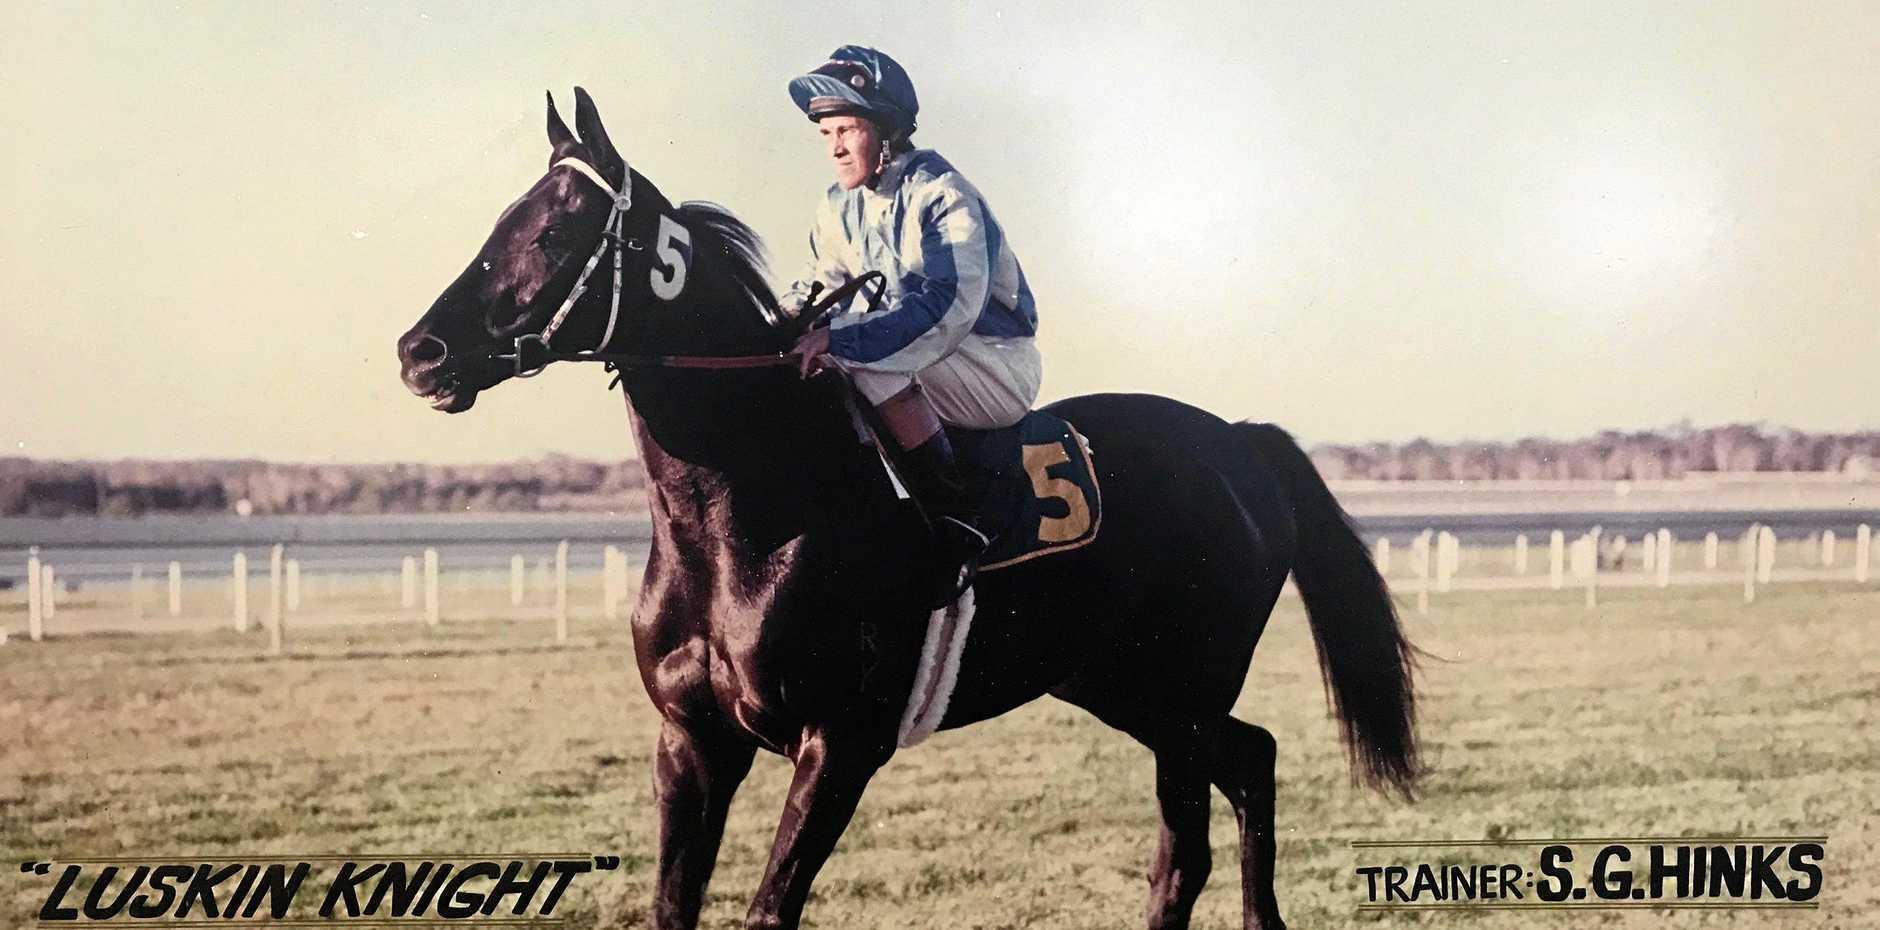 Luskin Knight, trained by Stuart Hinks.